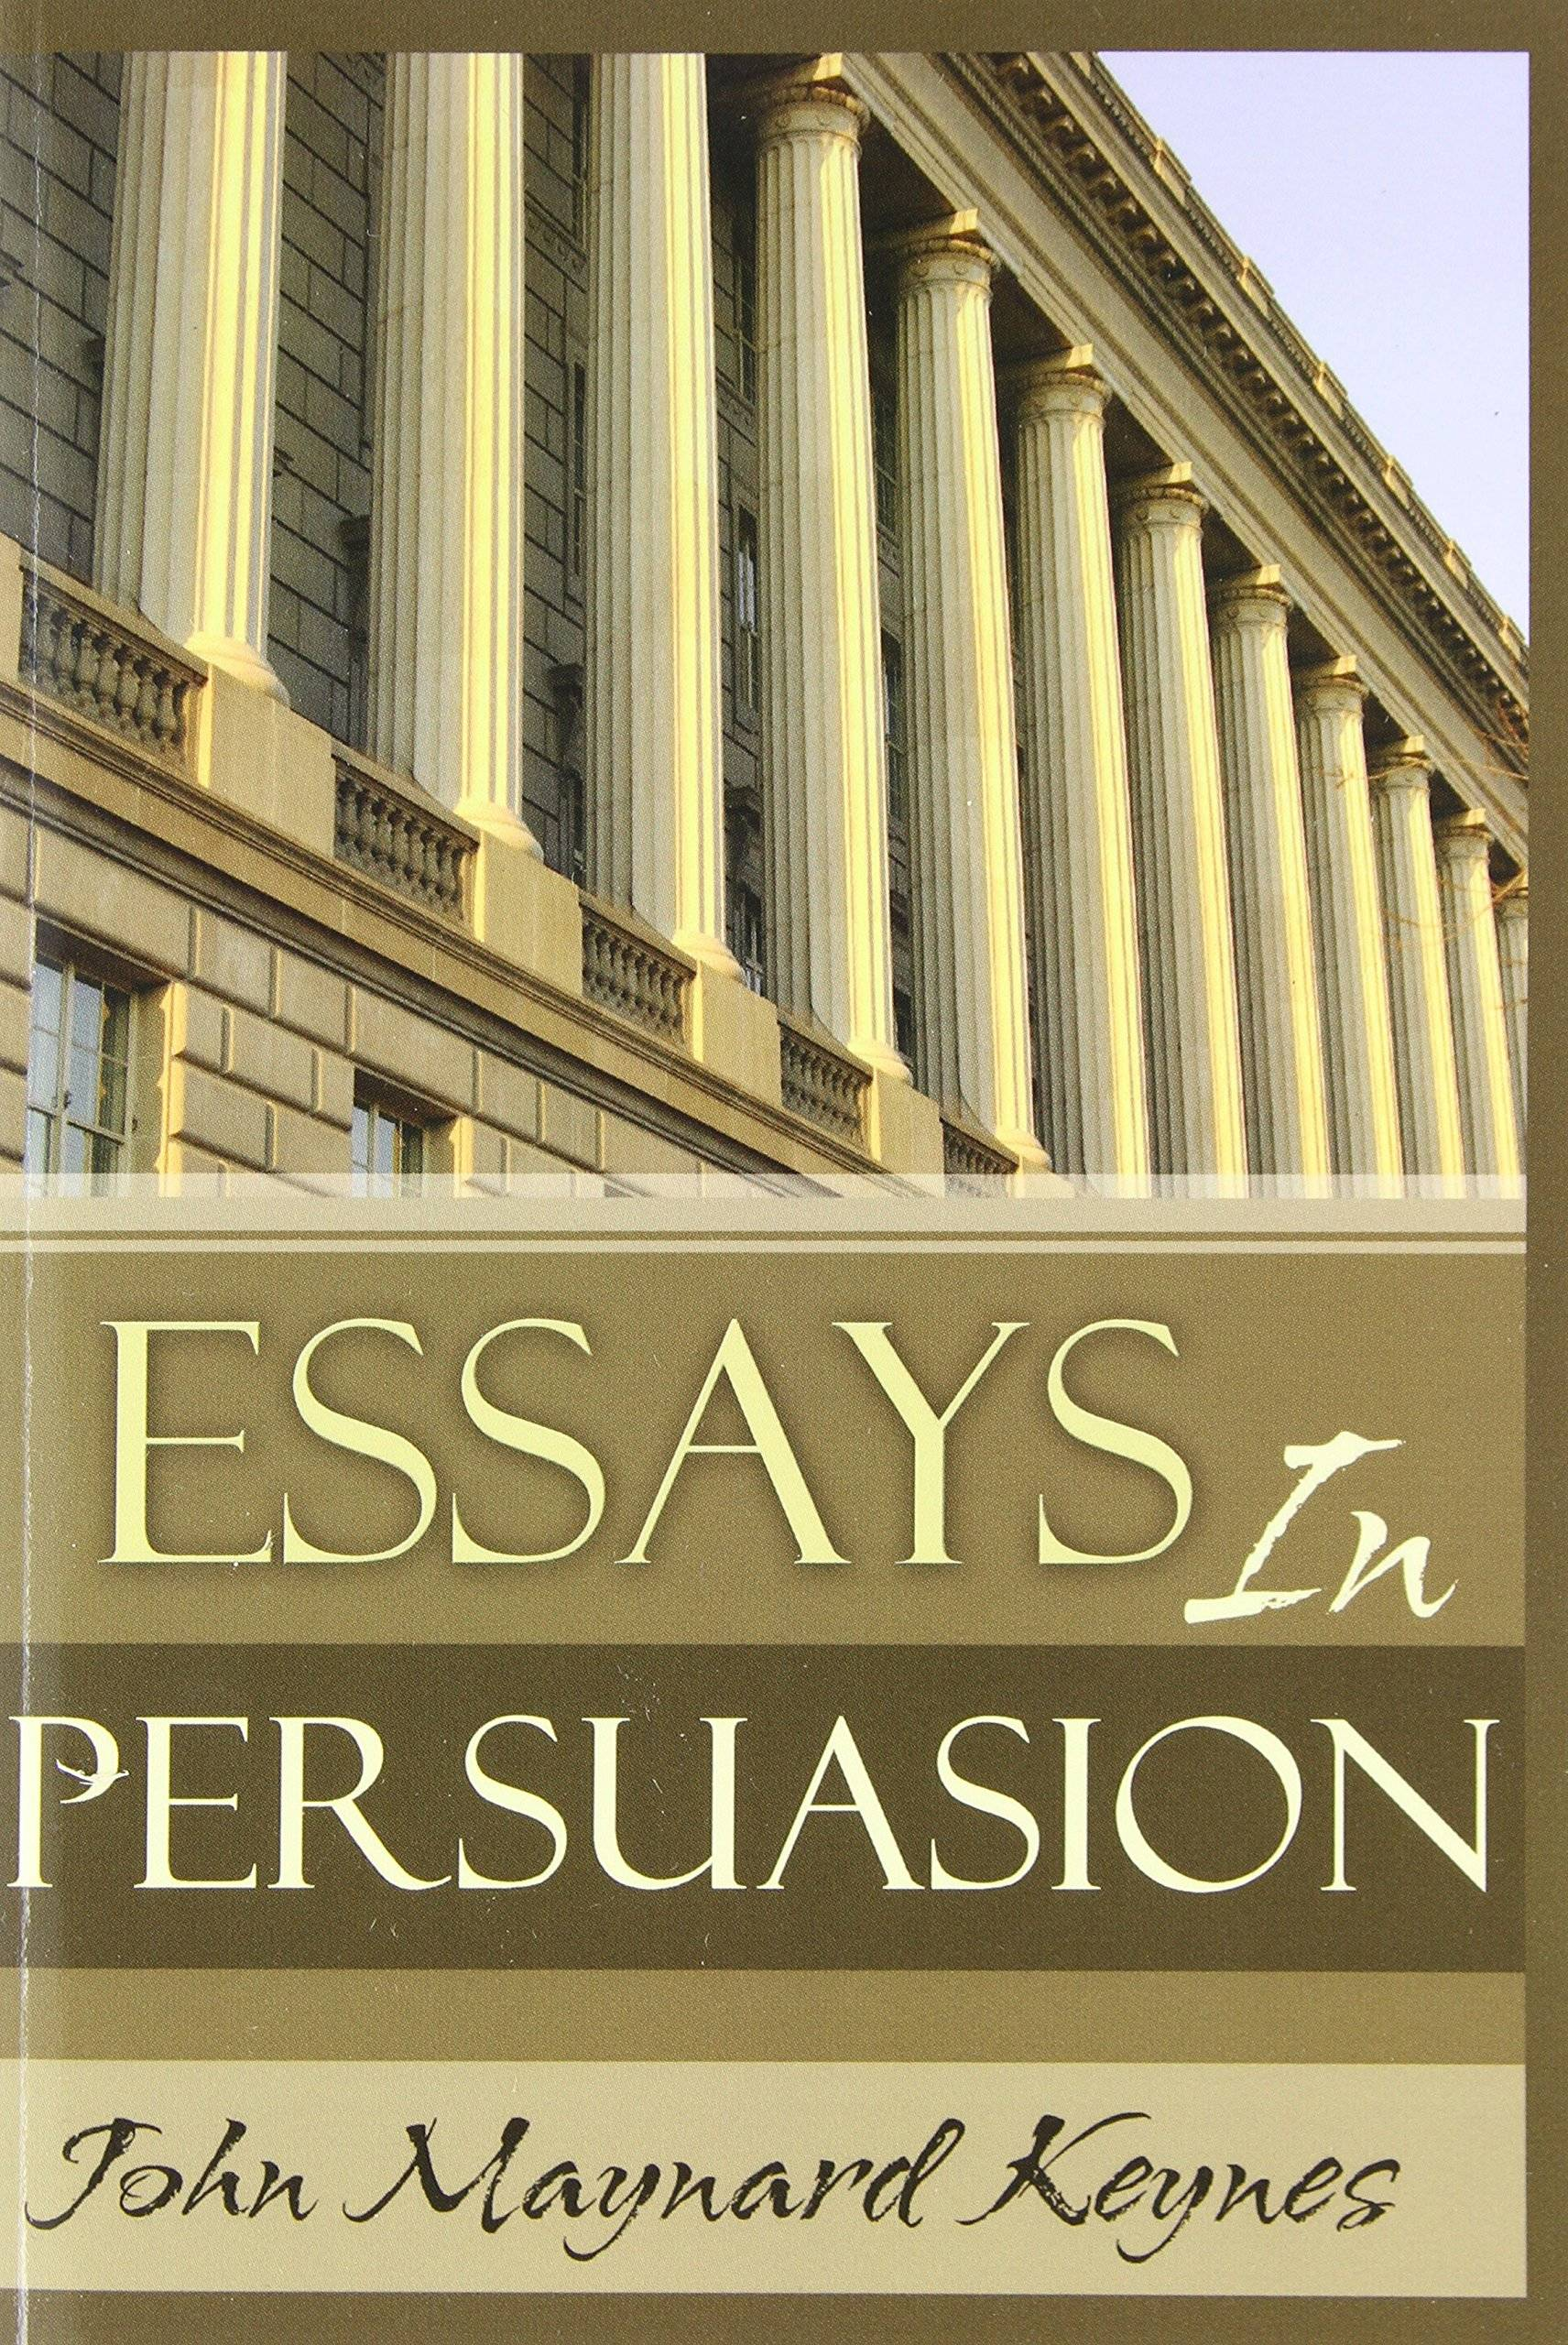 007 Essay Example Essays In Persuasion By John Maynard Remarkable Audiobook Pdf Keynes Summary Full